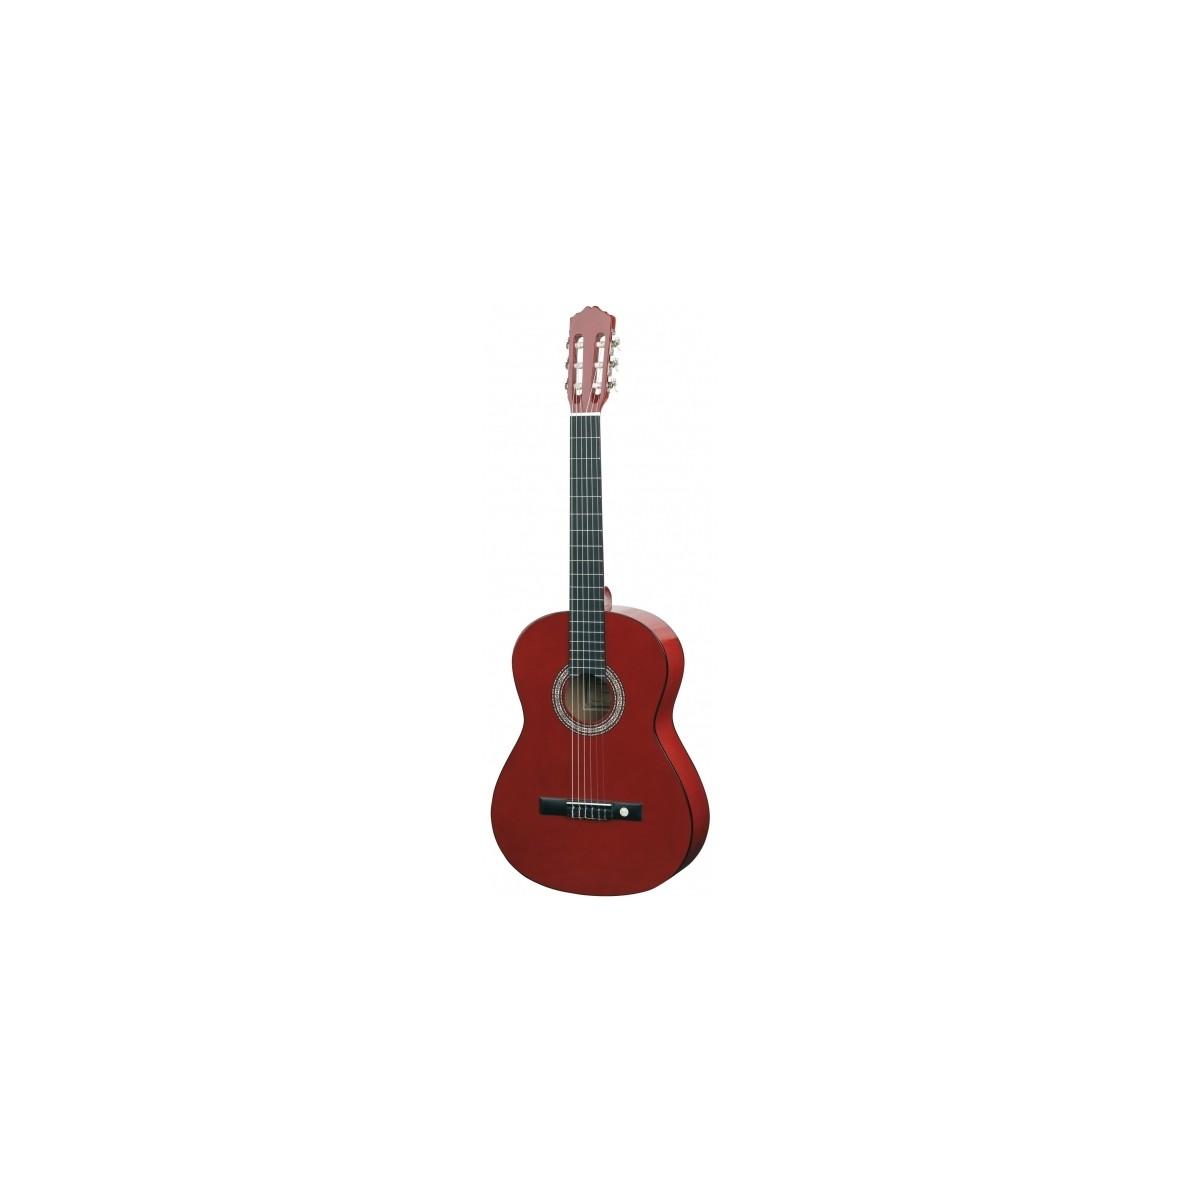 almeria guitare classique 3 4 rouge guitares acoustiques. Black Bedroom Furniture Sets. Home Design Ideas